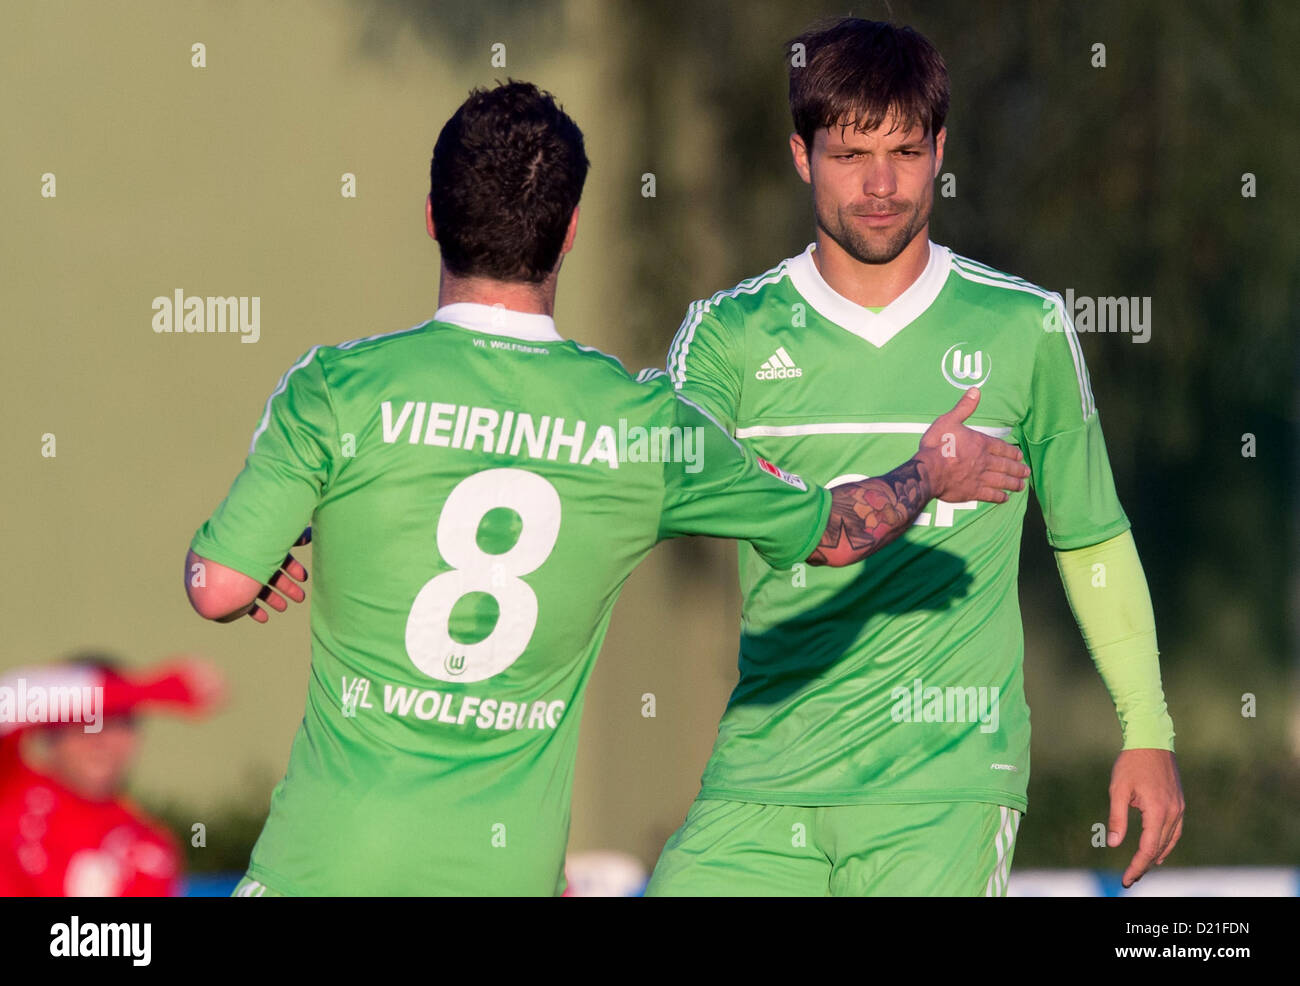 Wolfsburg's Vieirinha celebrates his 1-0 goal with Diego during the test match between VfLWolfsburg and - Stock Image